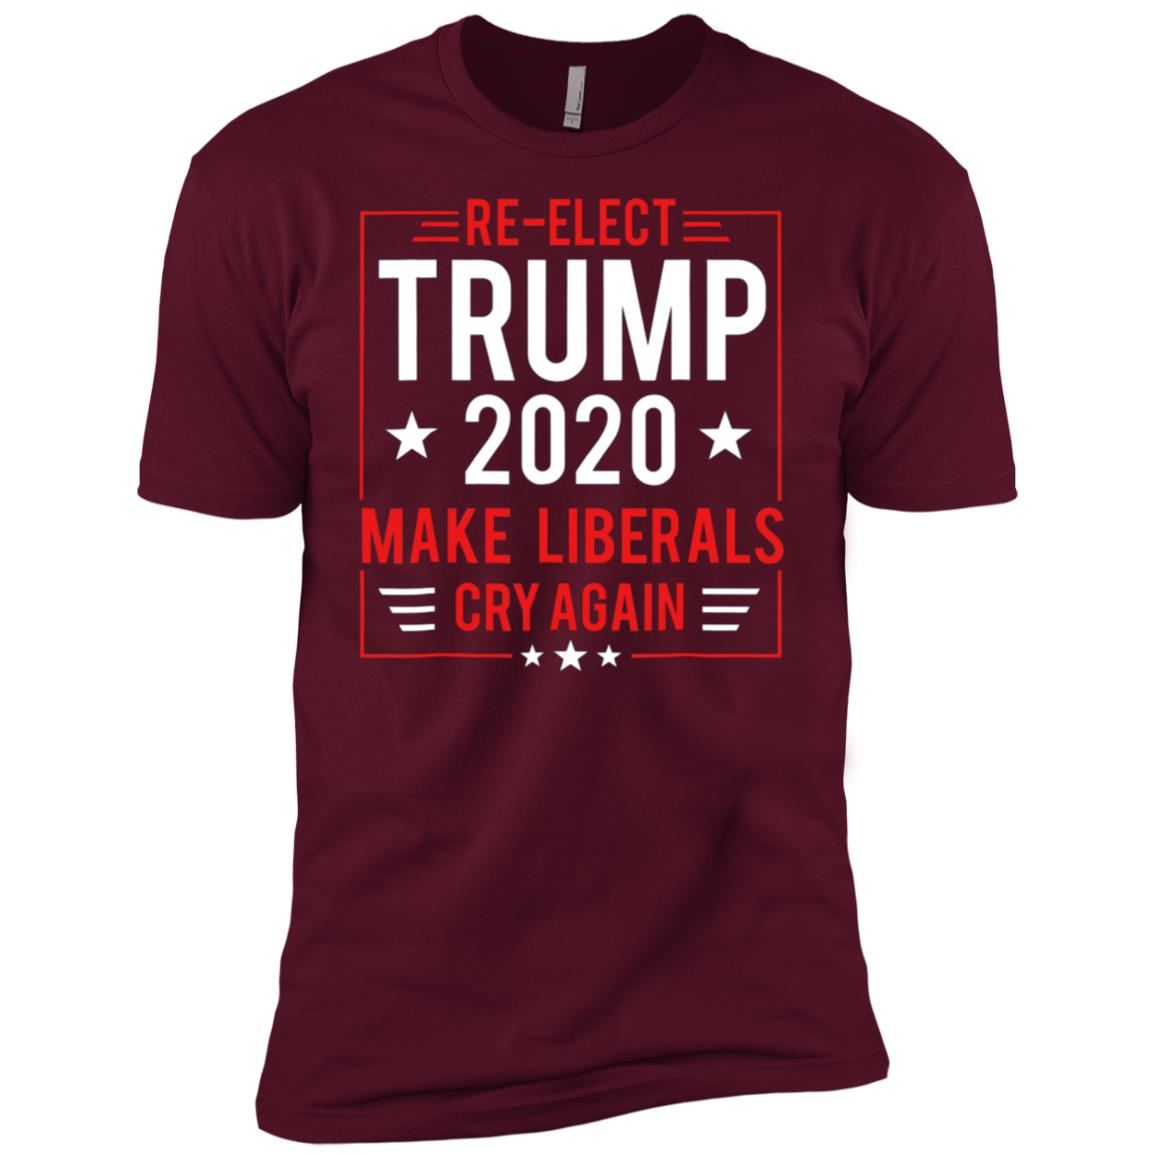 Re-elect Trump 2020 Make Liberals Cry Again Men Short Sleeve T-Shirt